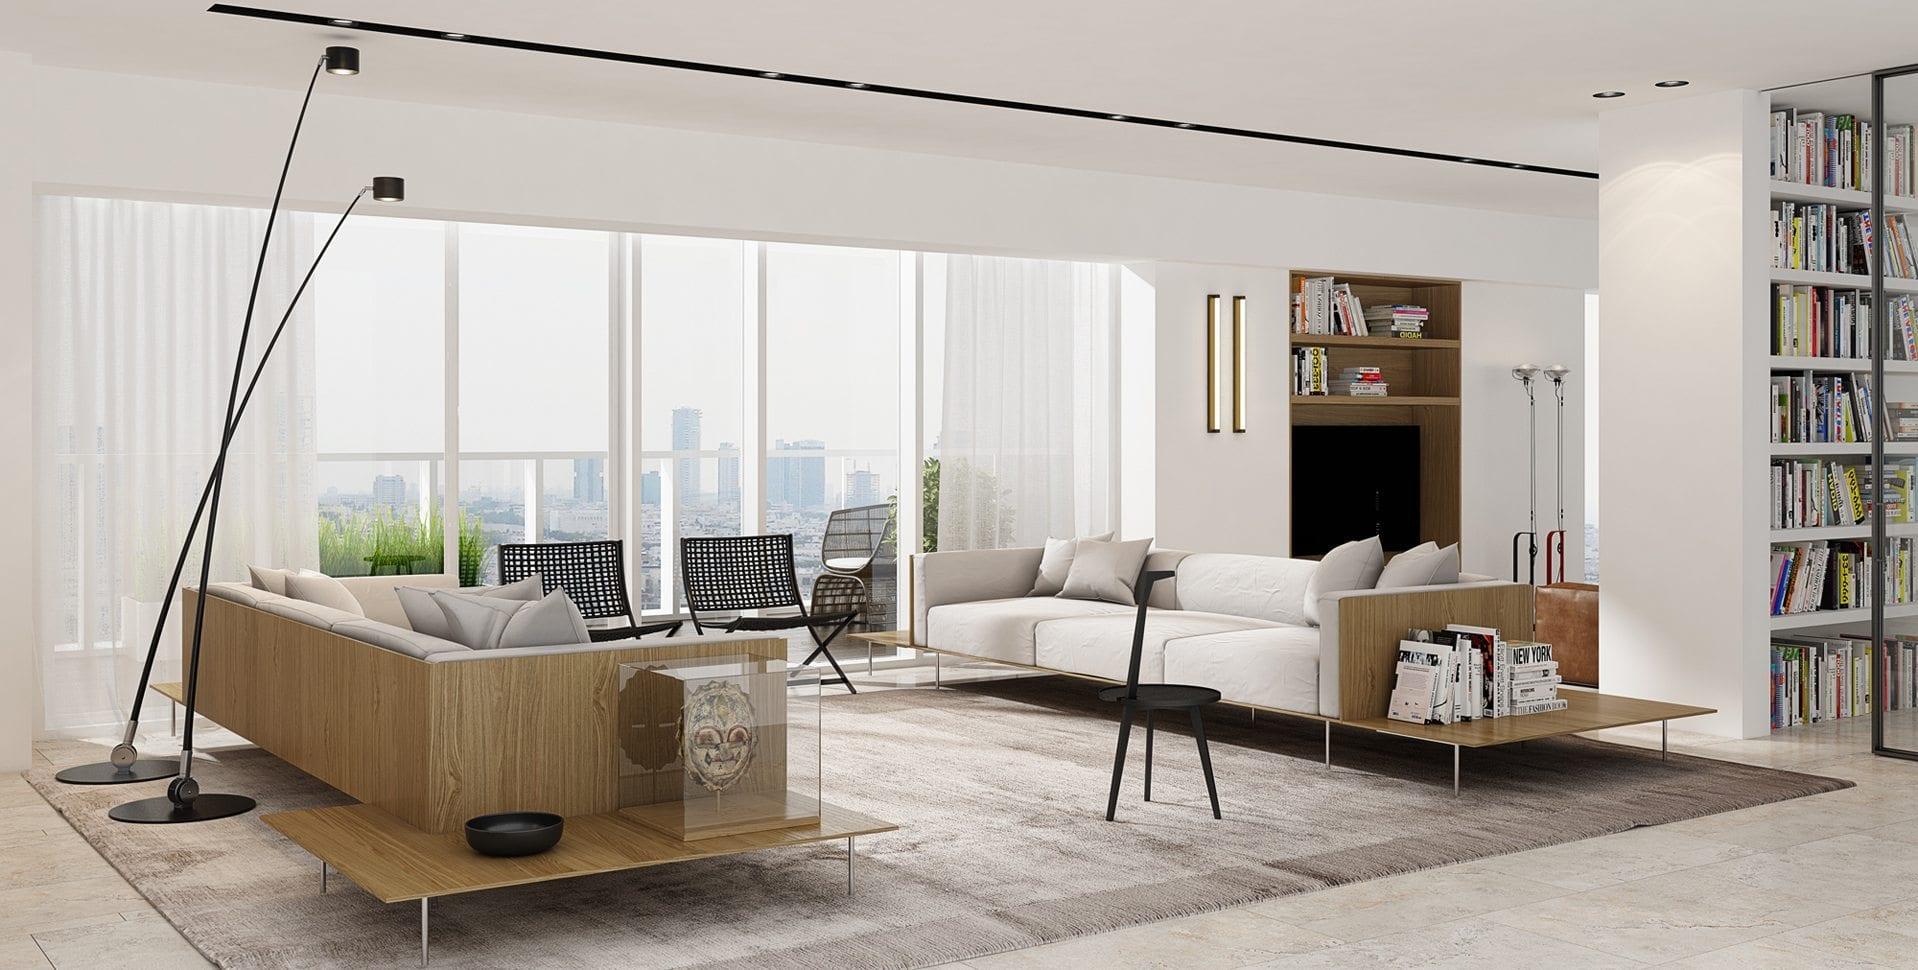 Maayan-Golan_Architectural-Visualization_ penthouse-interior-visualization_living-room_ design-itzik-eini_04